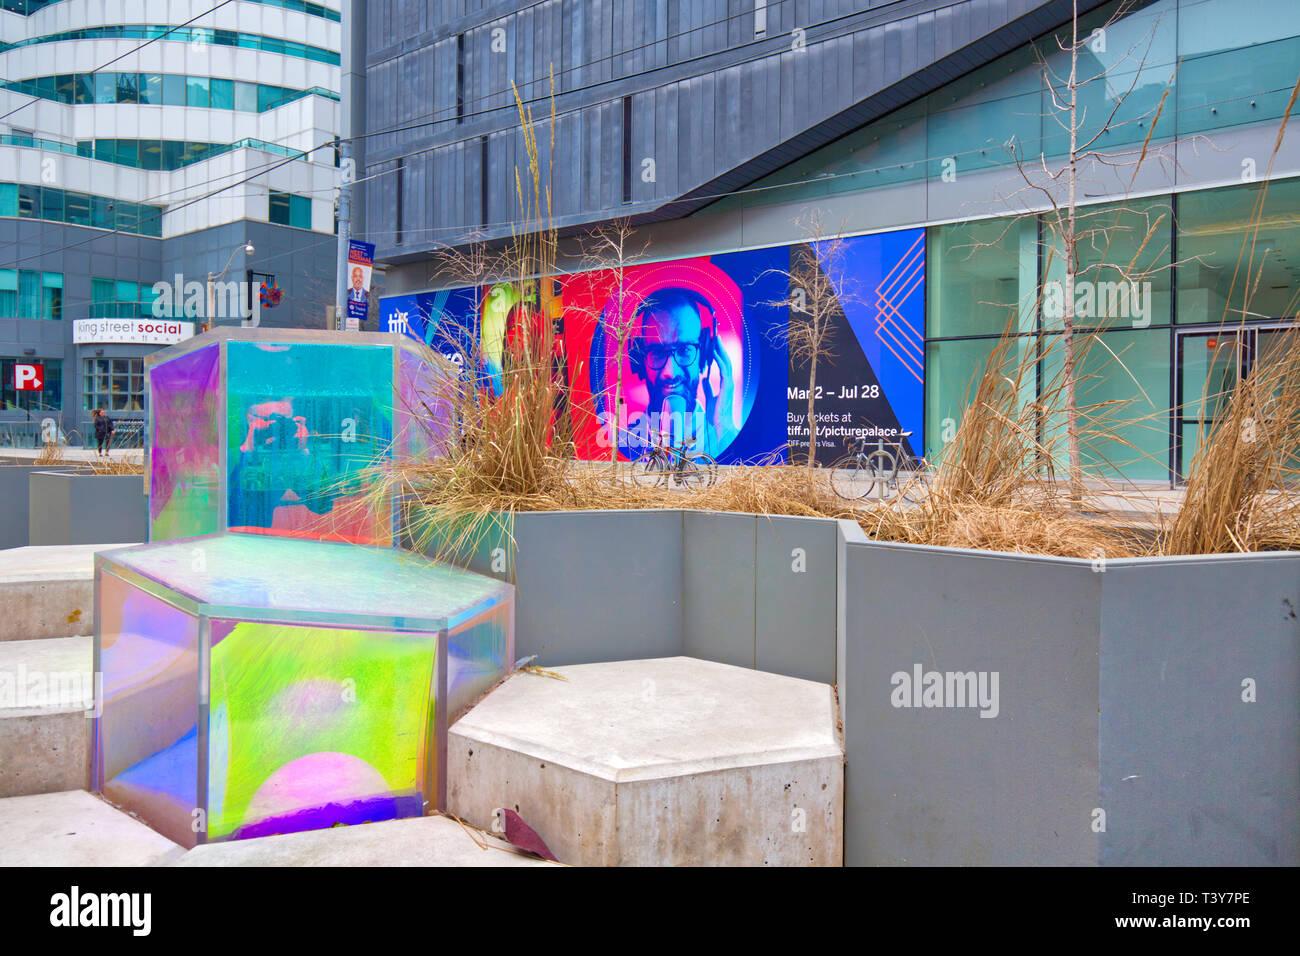 Toronto, Kanada - 12 Oktober, 2018: Bunte Stühle in der King Street in Front, wenn TIFF (Toronto International Film Festival) Eingang Stockbild